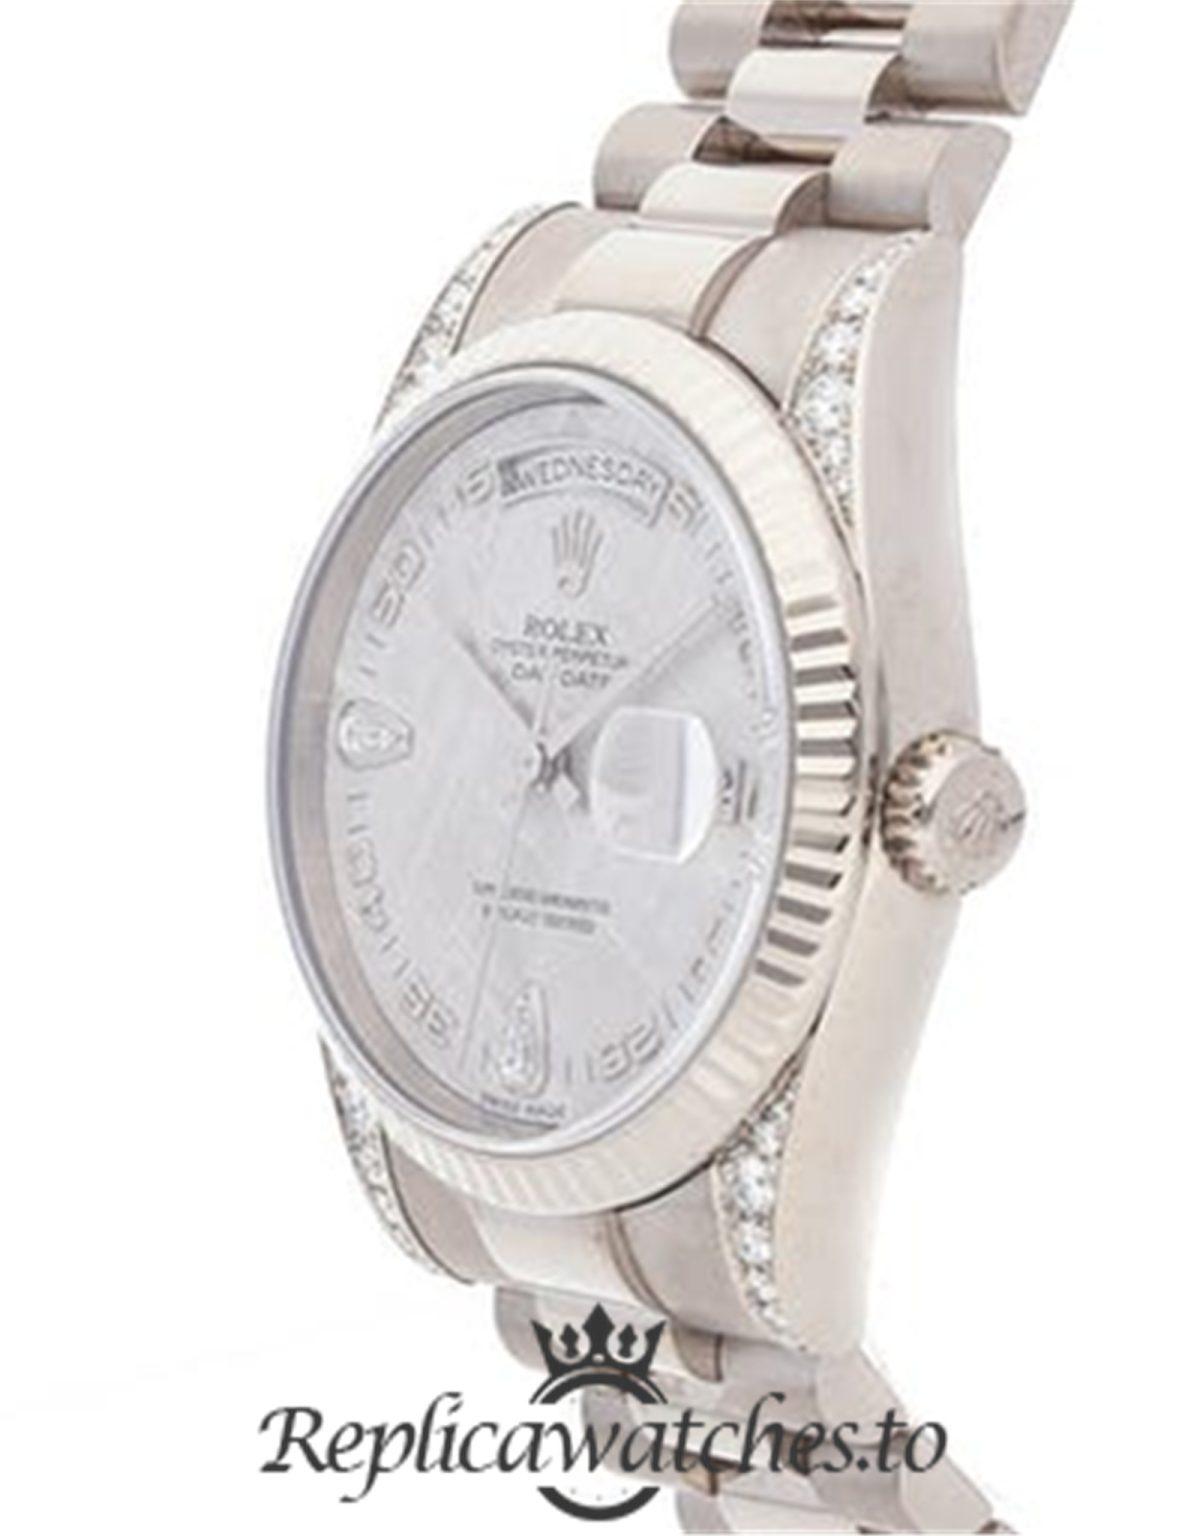 Rolex Day Date Replica 118339 Silver Strap 36MM